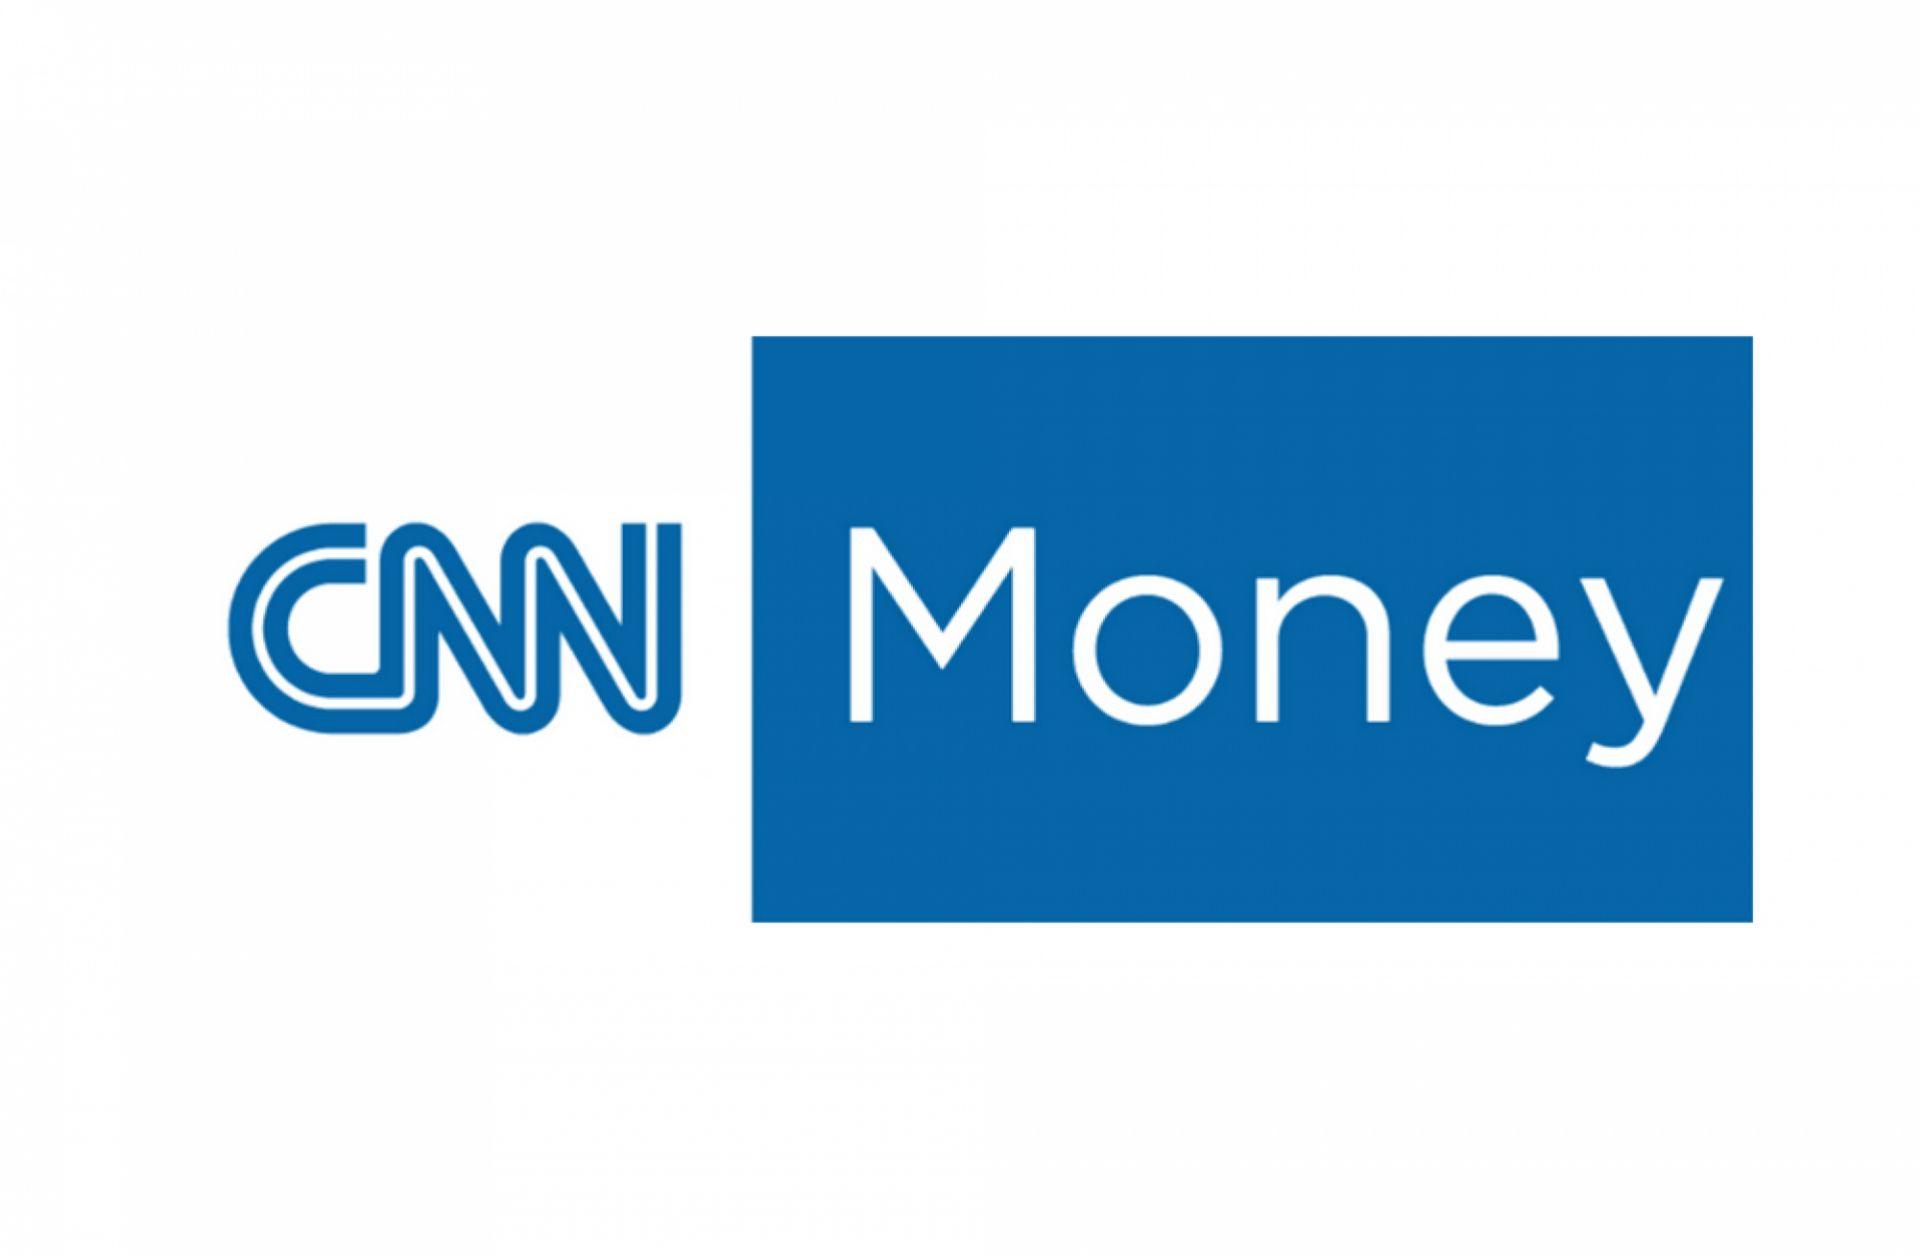 CNN_Money logo.jpg